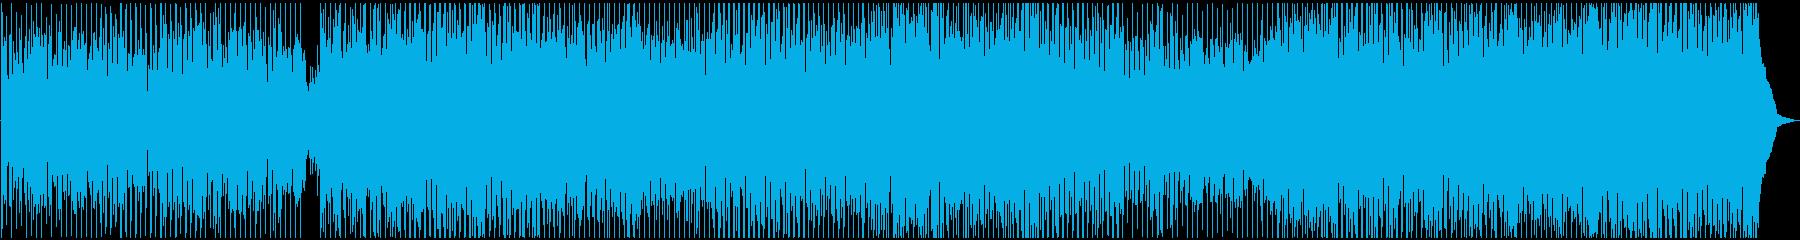 Inspiring Corporat.B's reproduced waveform